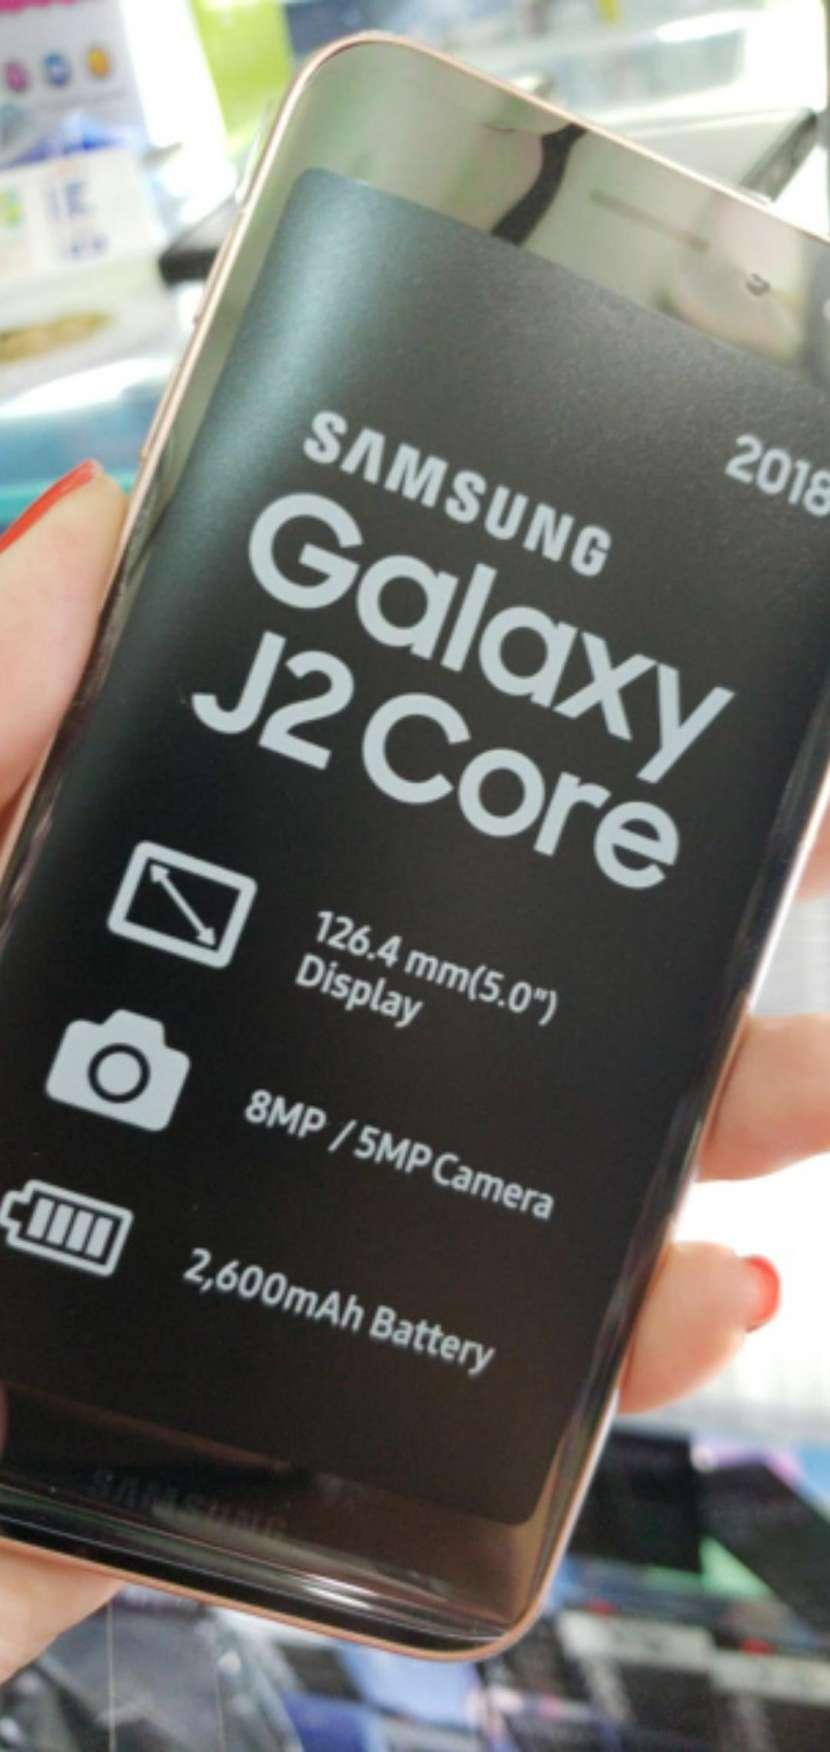 Samsung Galaxy j2 core - 0